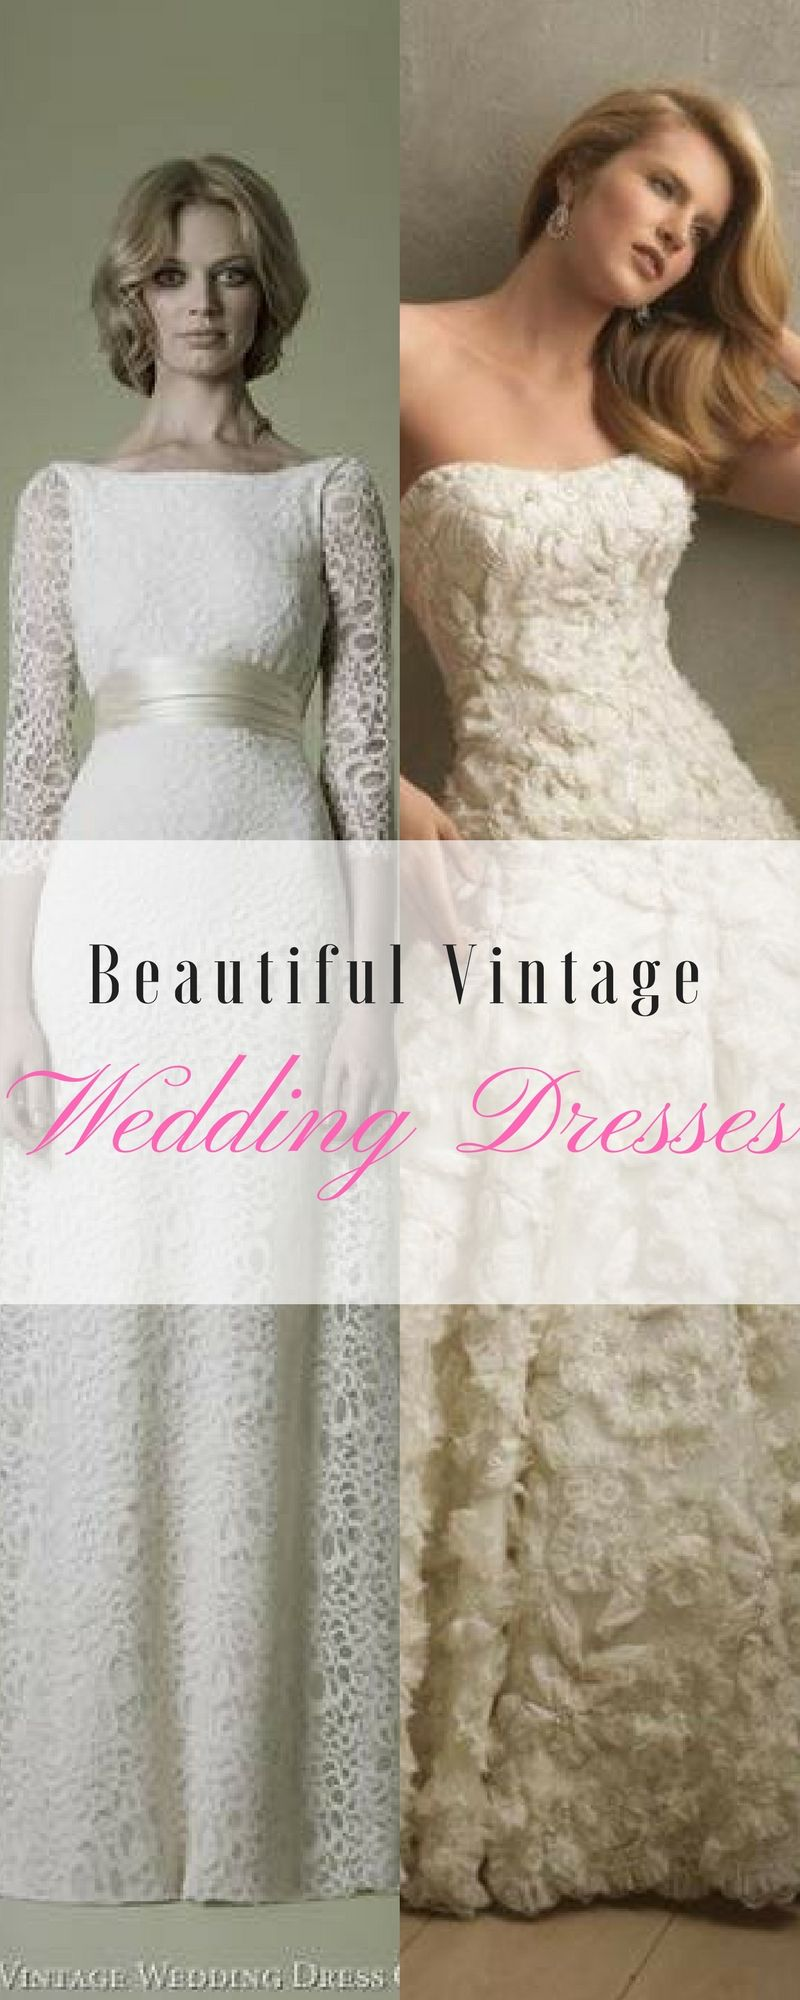 Beautiful vintage wedding dresses vintage weddings wedding dress